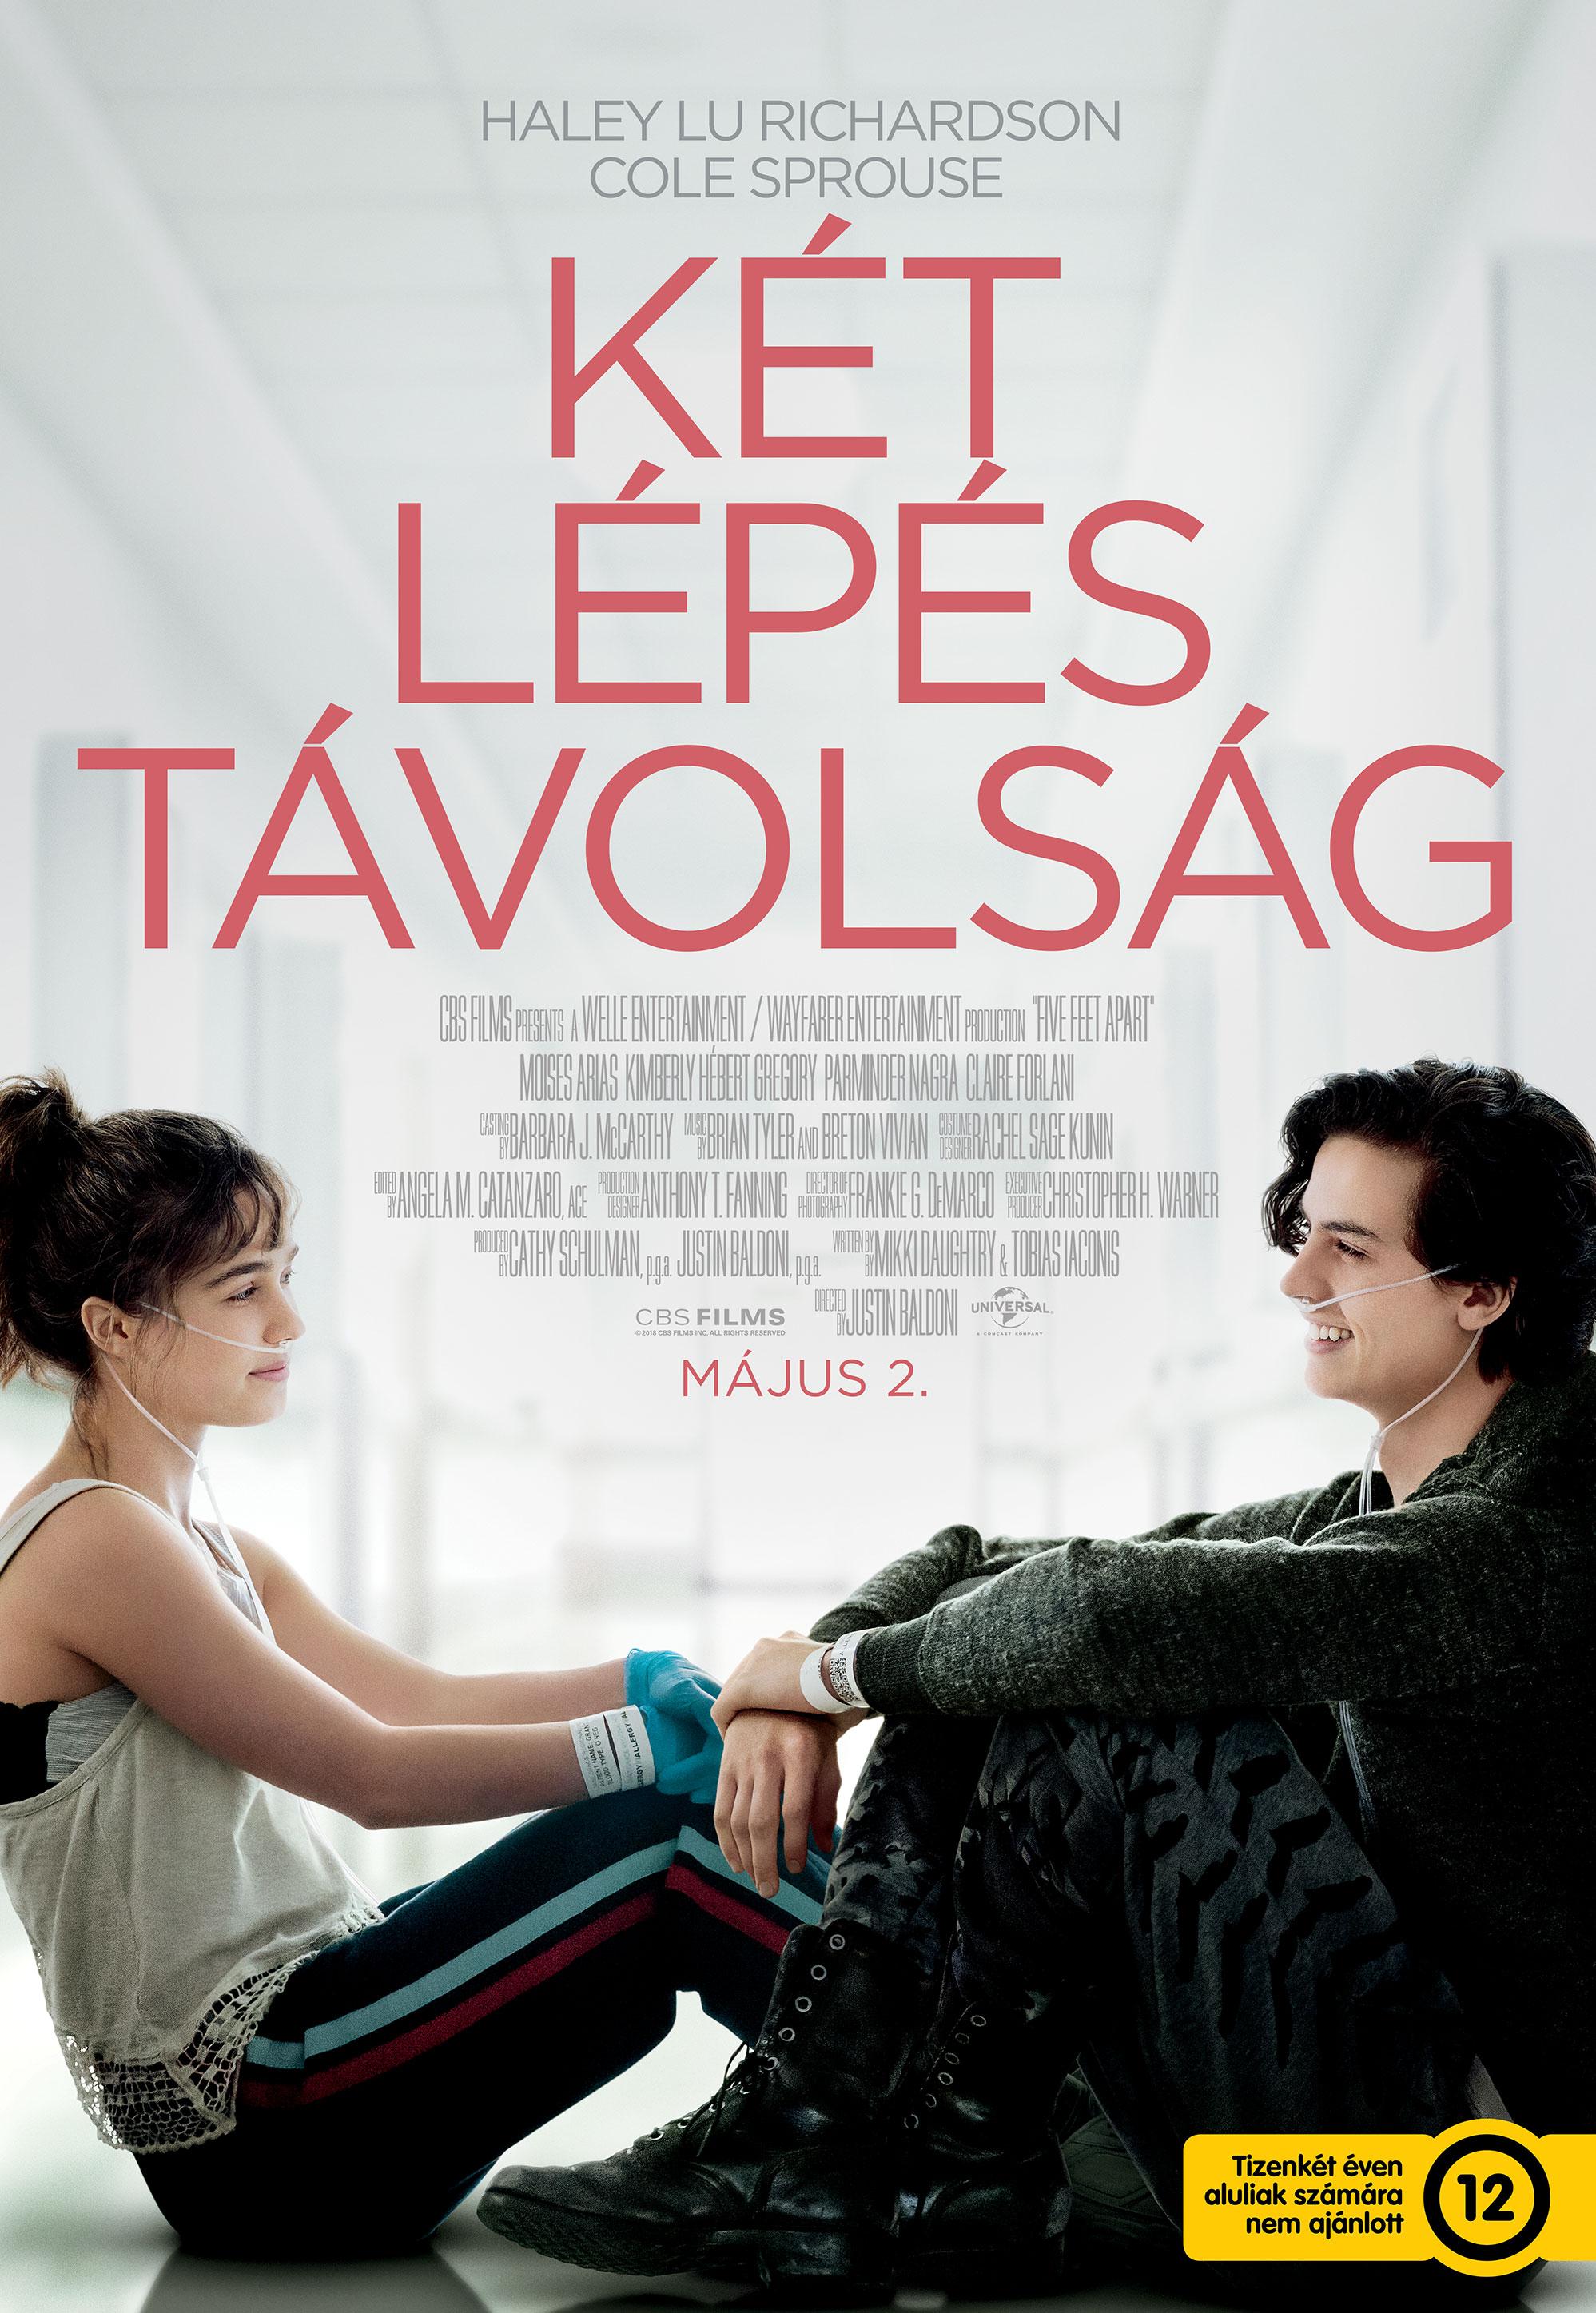 ket_lepes_tavolsag_hun_p1.png